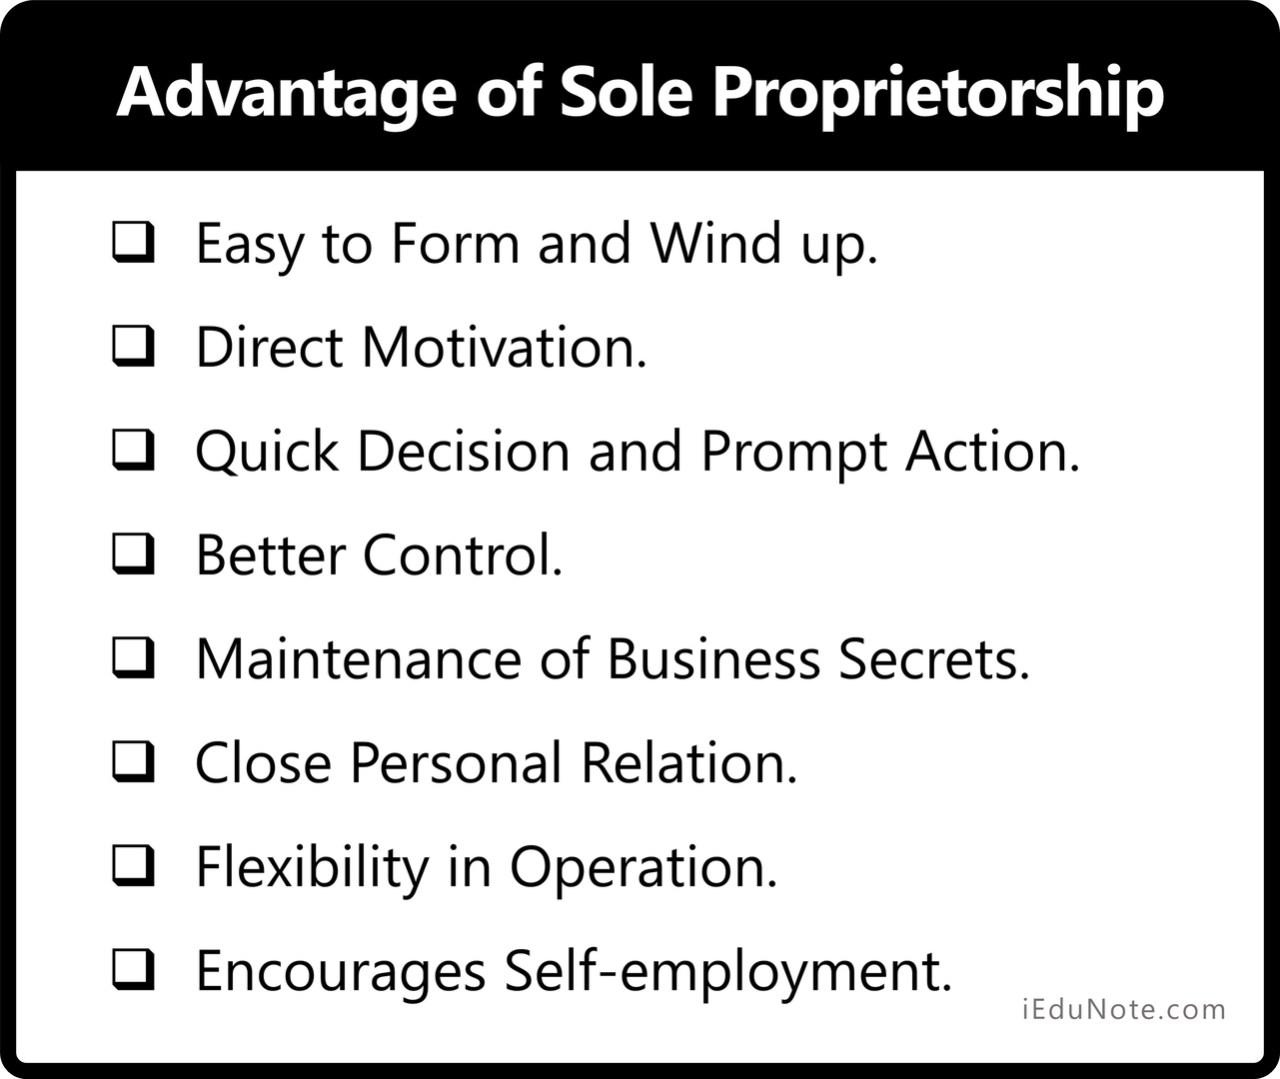 Advantage of Sole Proprietorship - What gives Sole Proprietor an Advantage Over Giants?